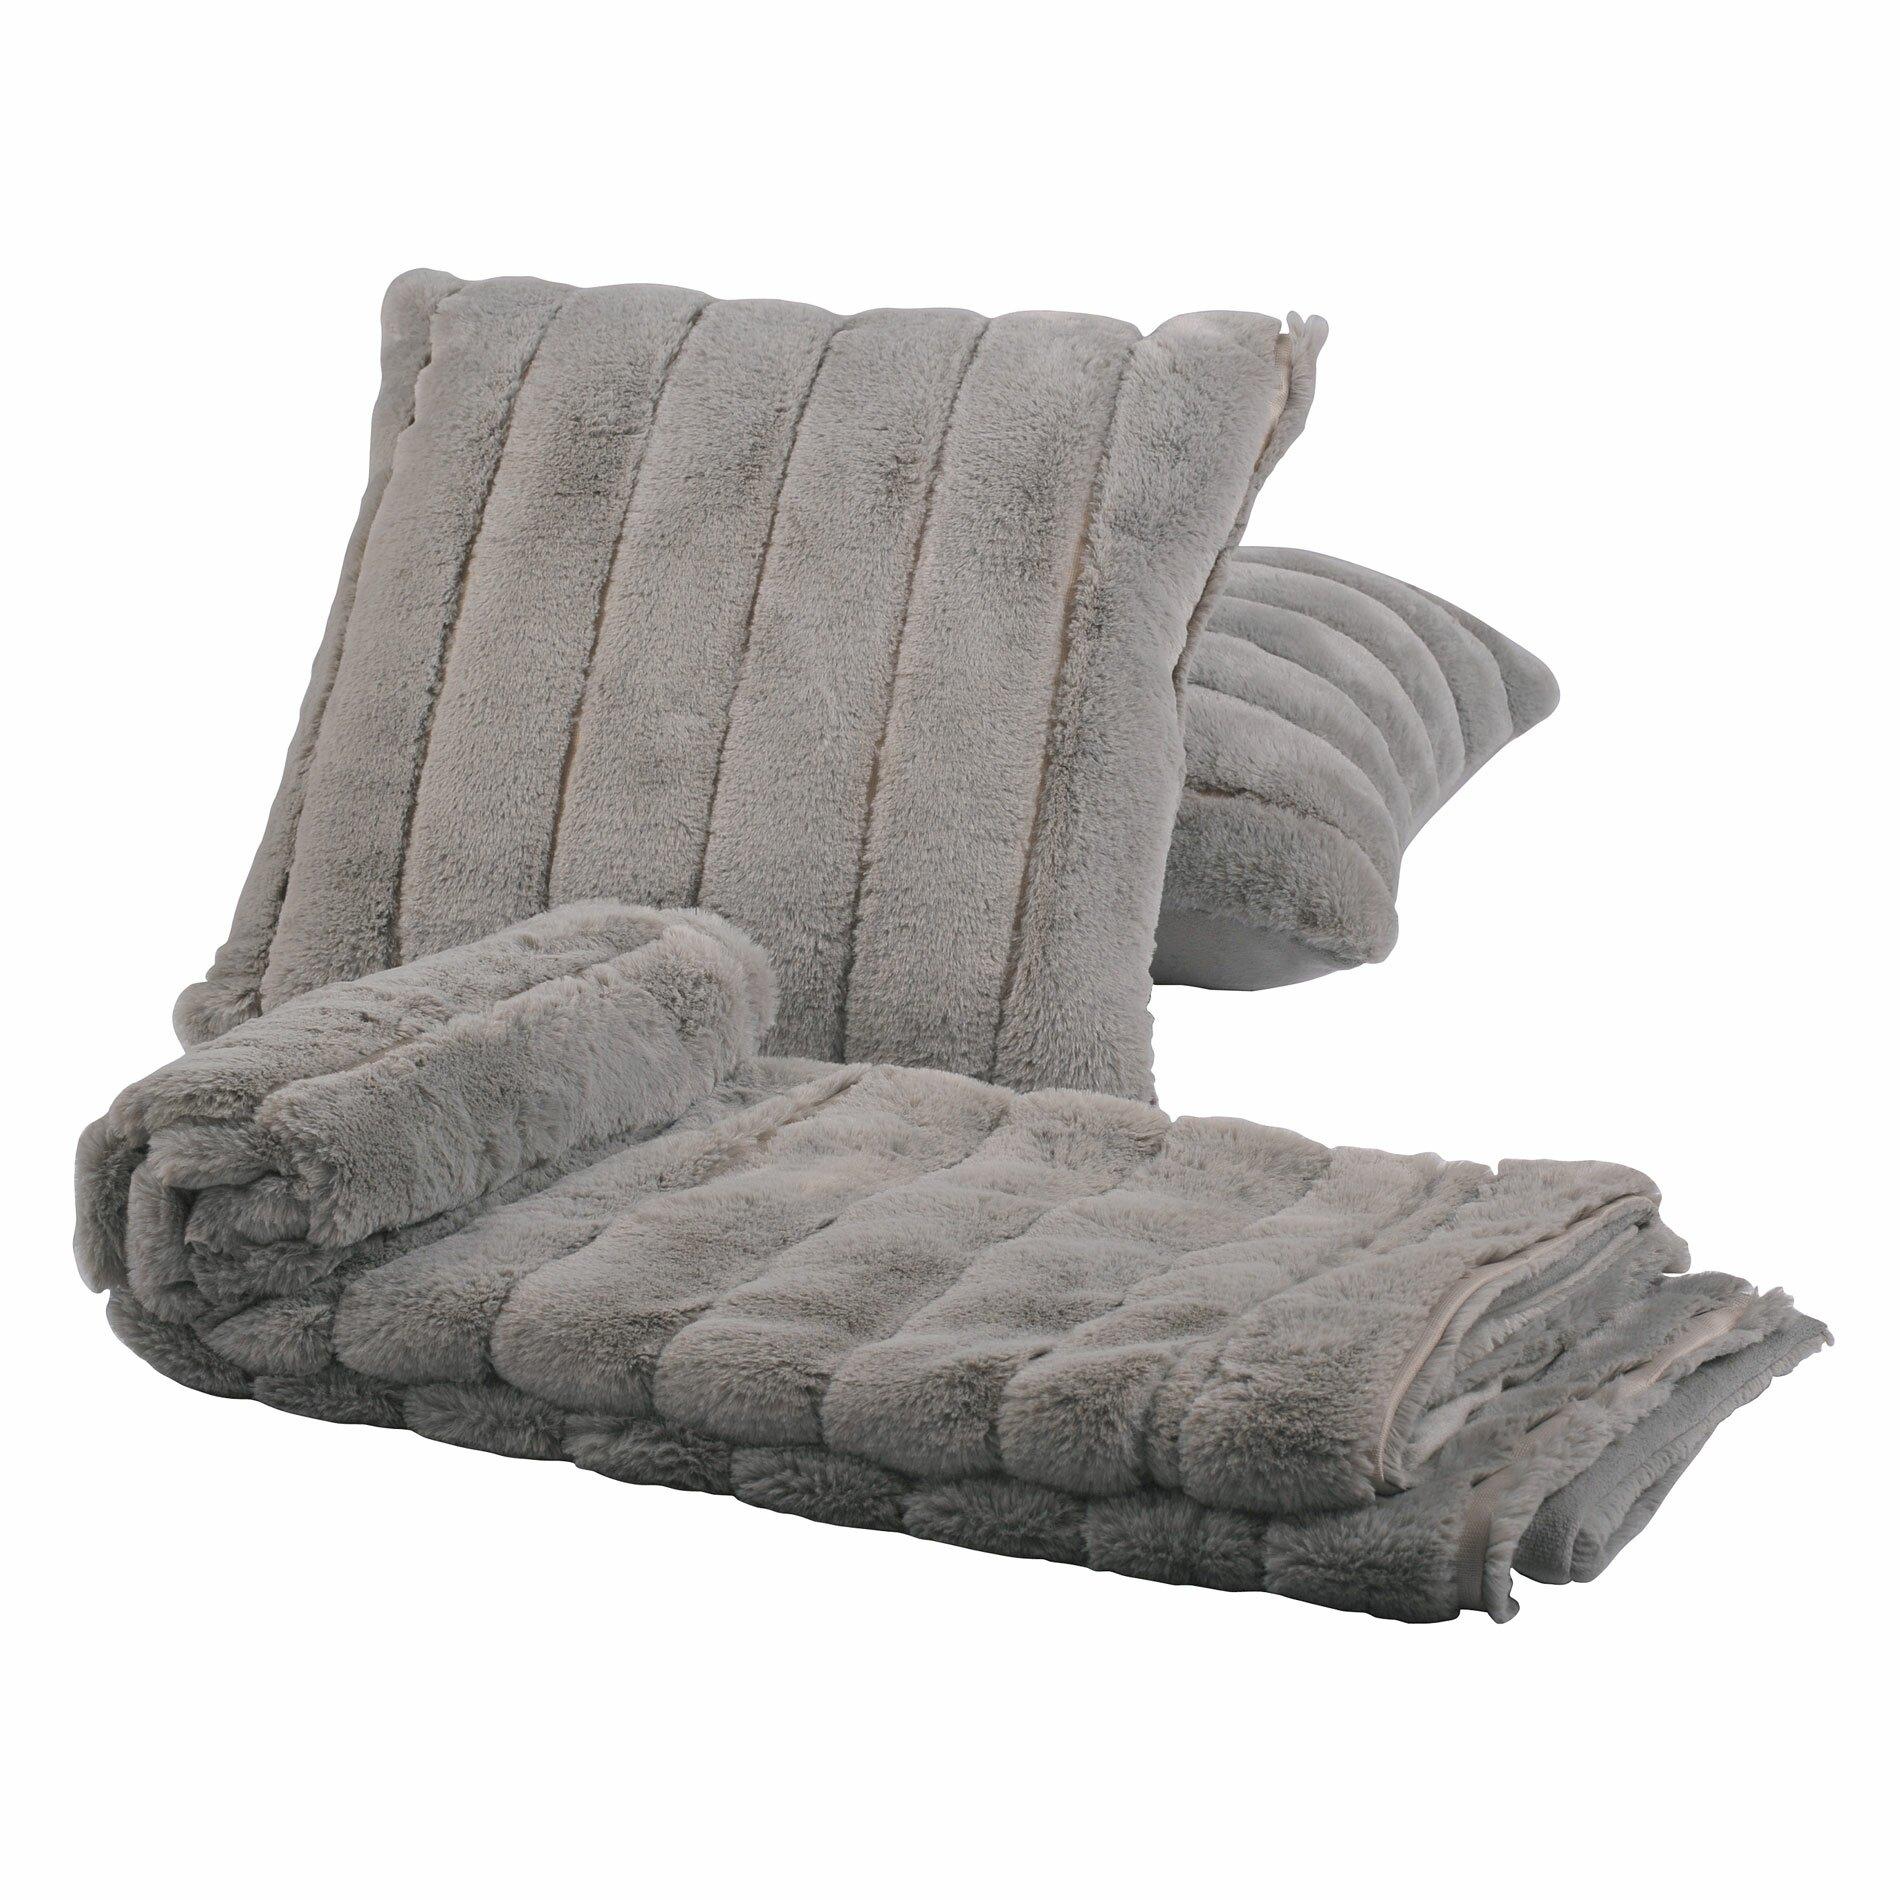 BOON Throw & Blanket Luxury Rabbit Faux Fur Throw and Pillow Combo & Reviews Wayfair